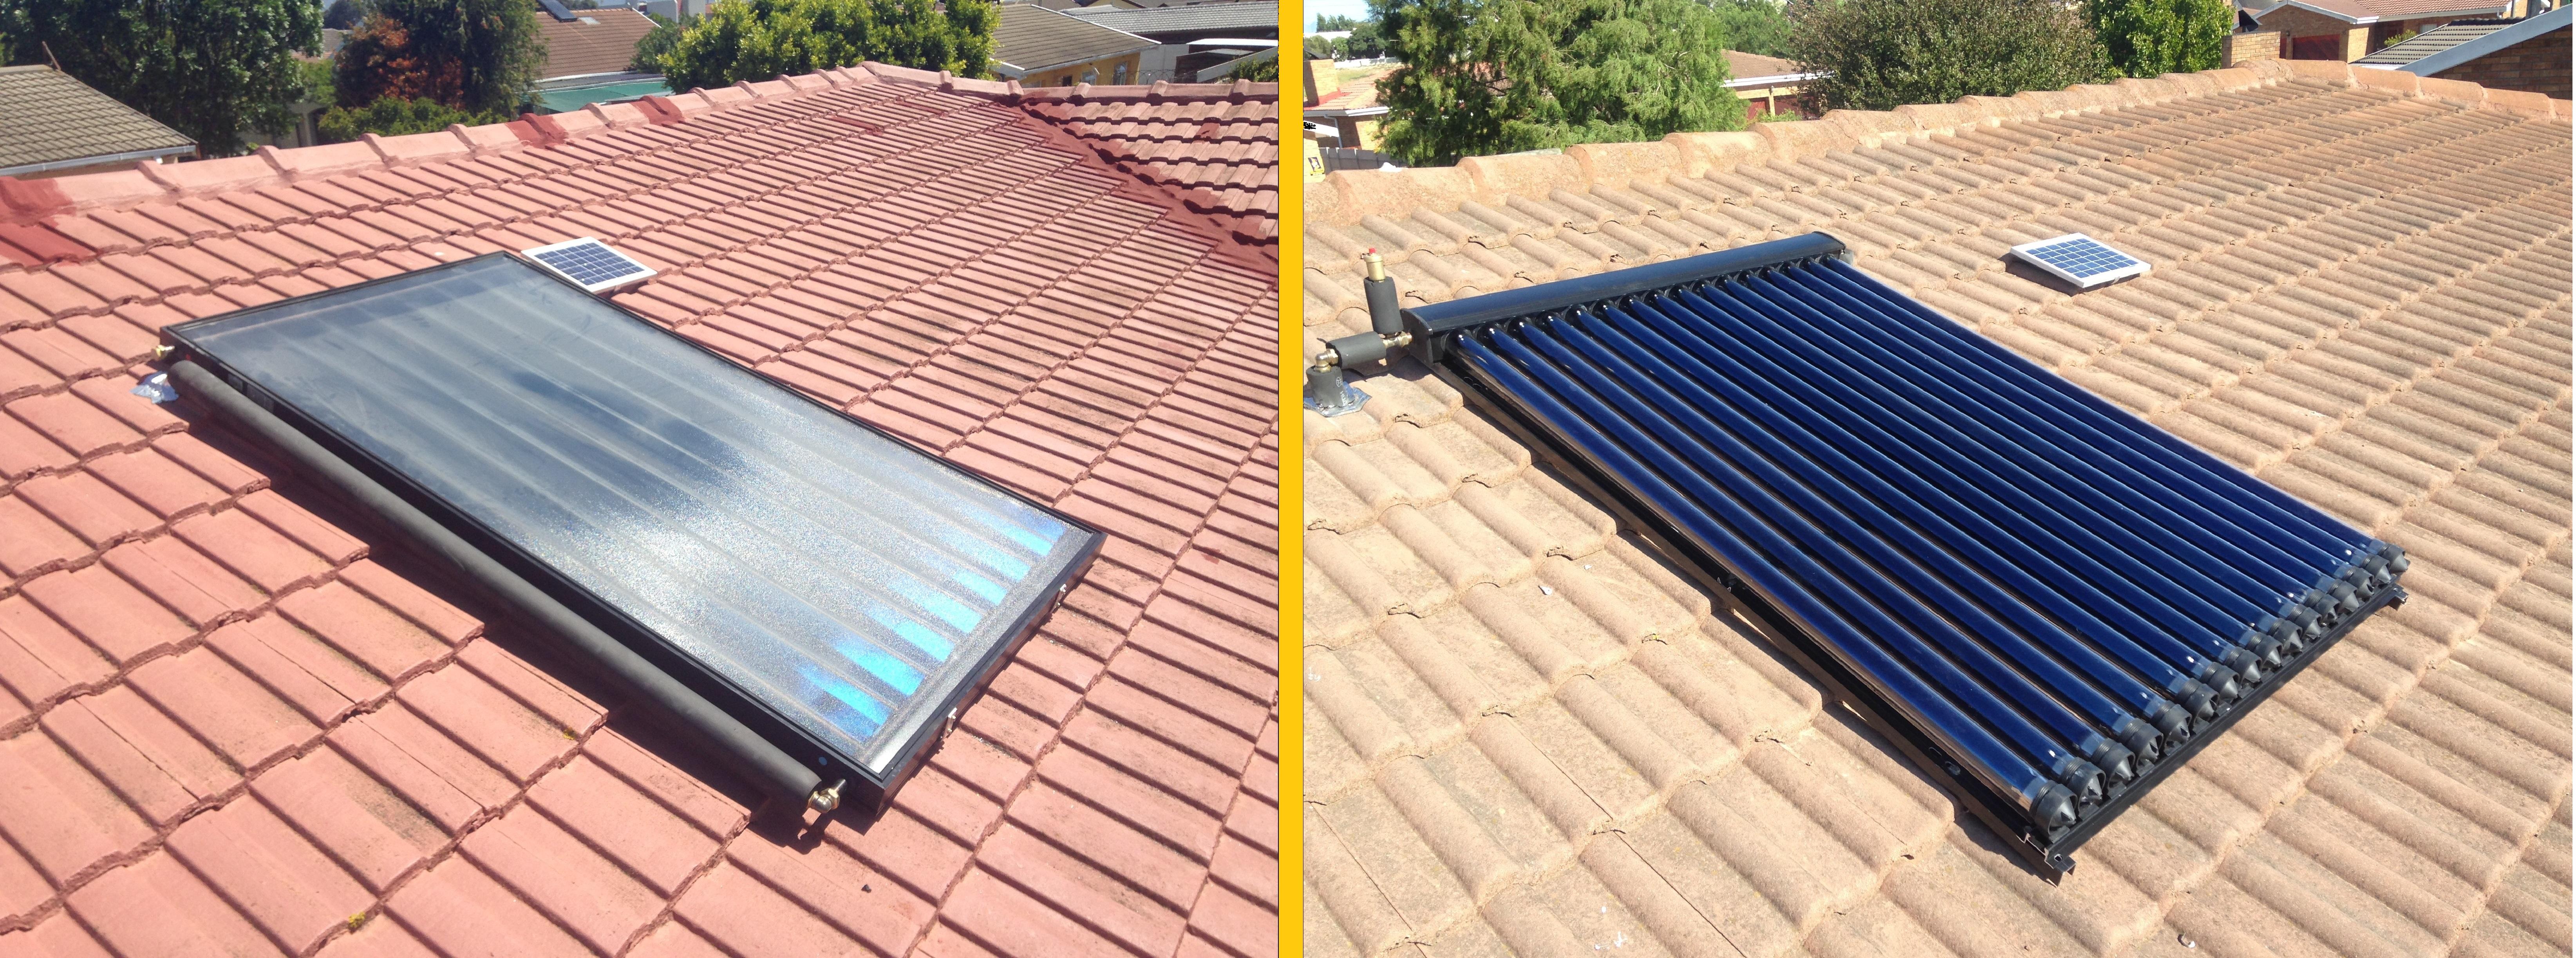 Solar Water Heating Geysers